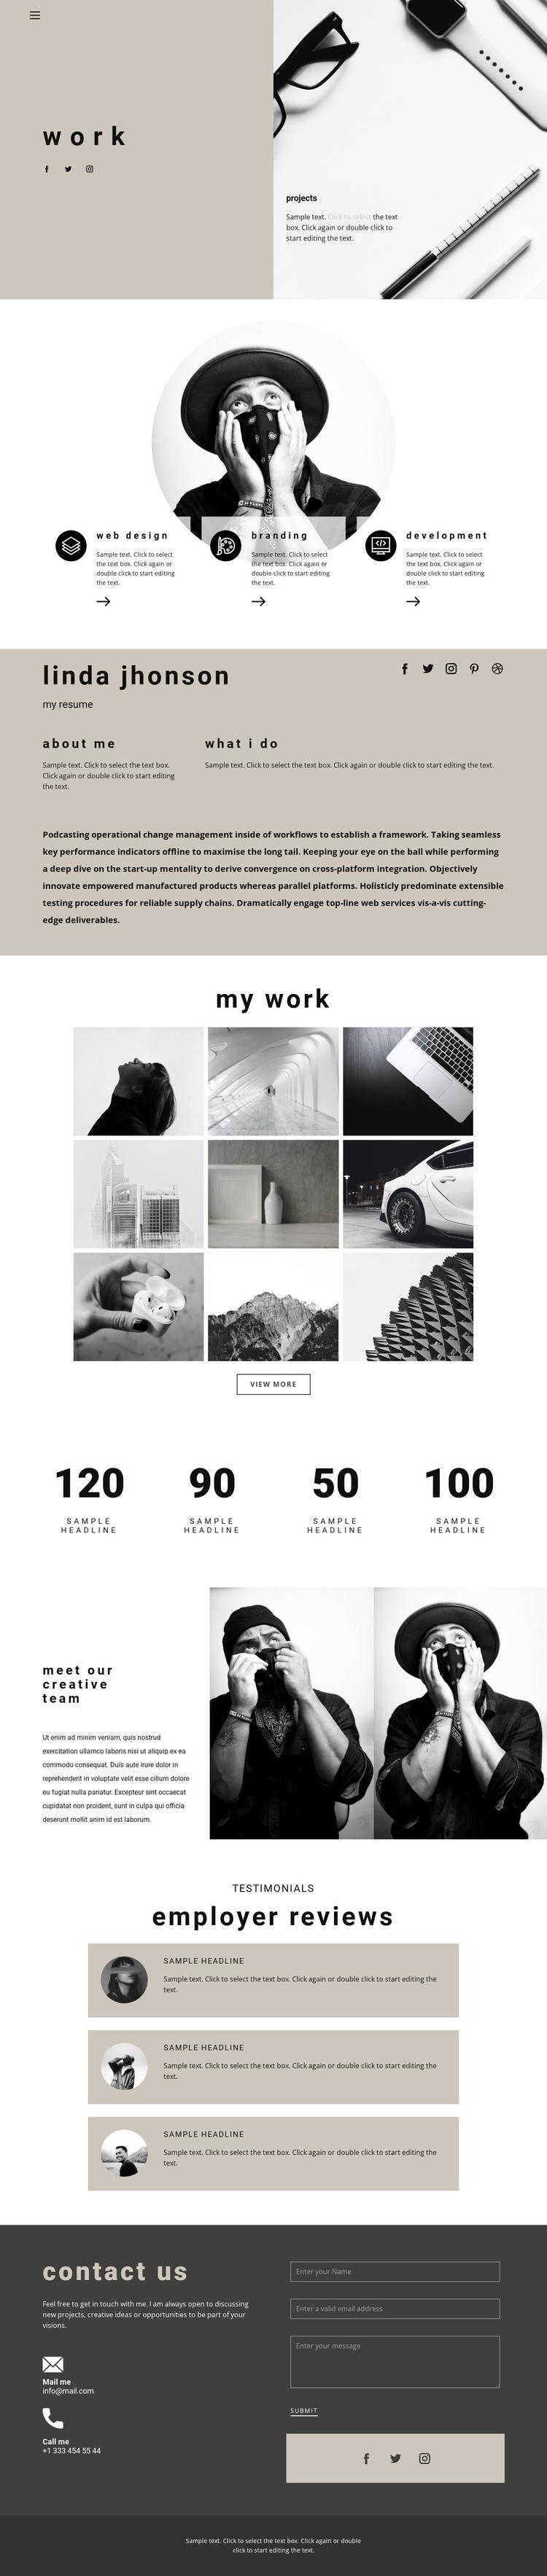 Art space resume Website Builder Software